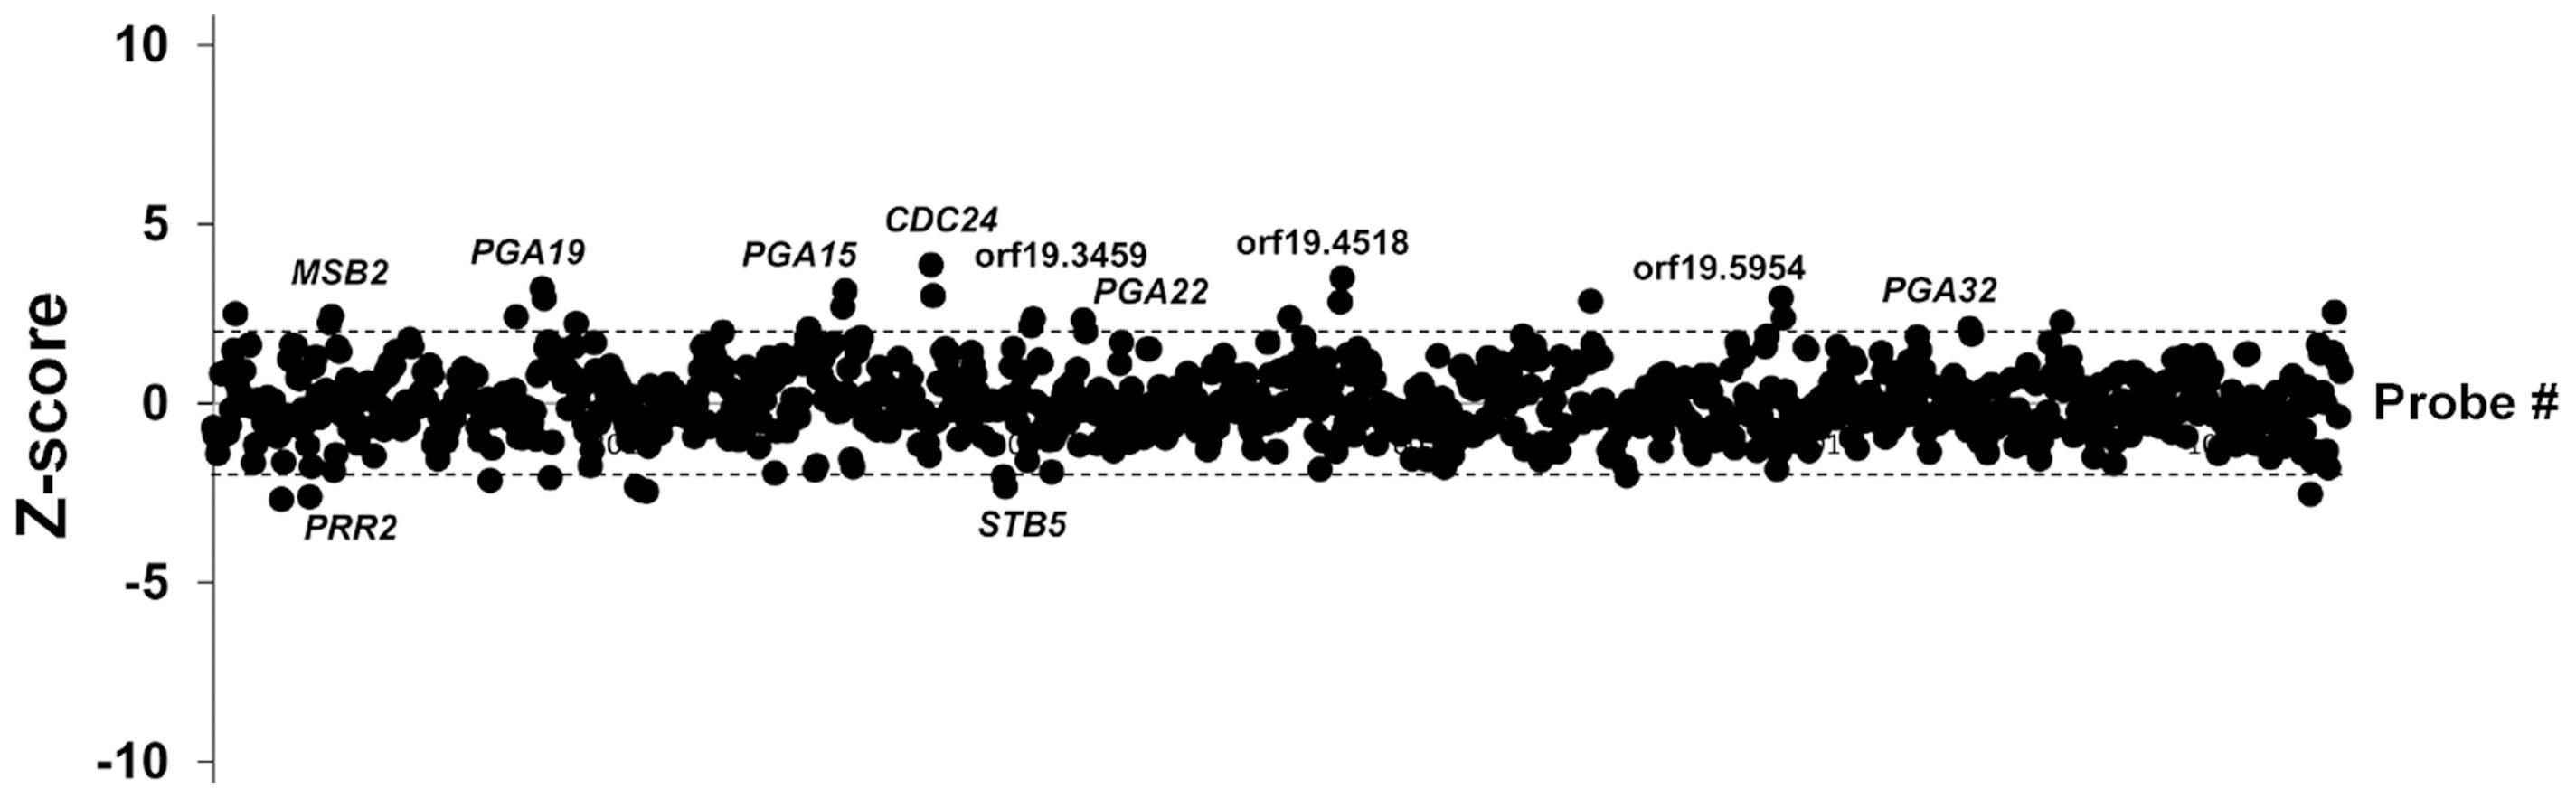 Competitive strain occupancy profiling in a multi-strain biofilm.